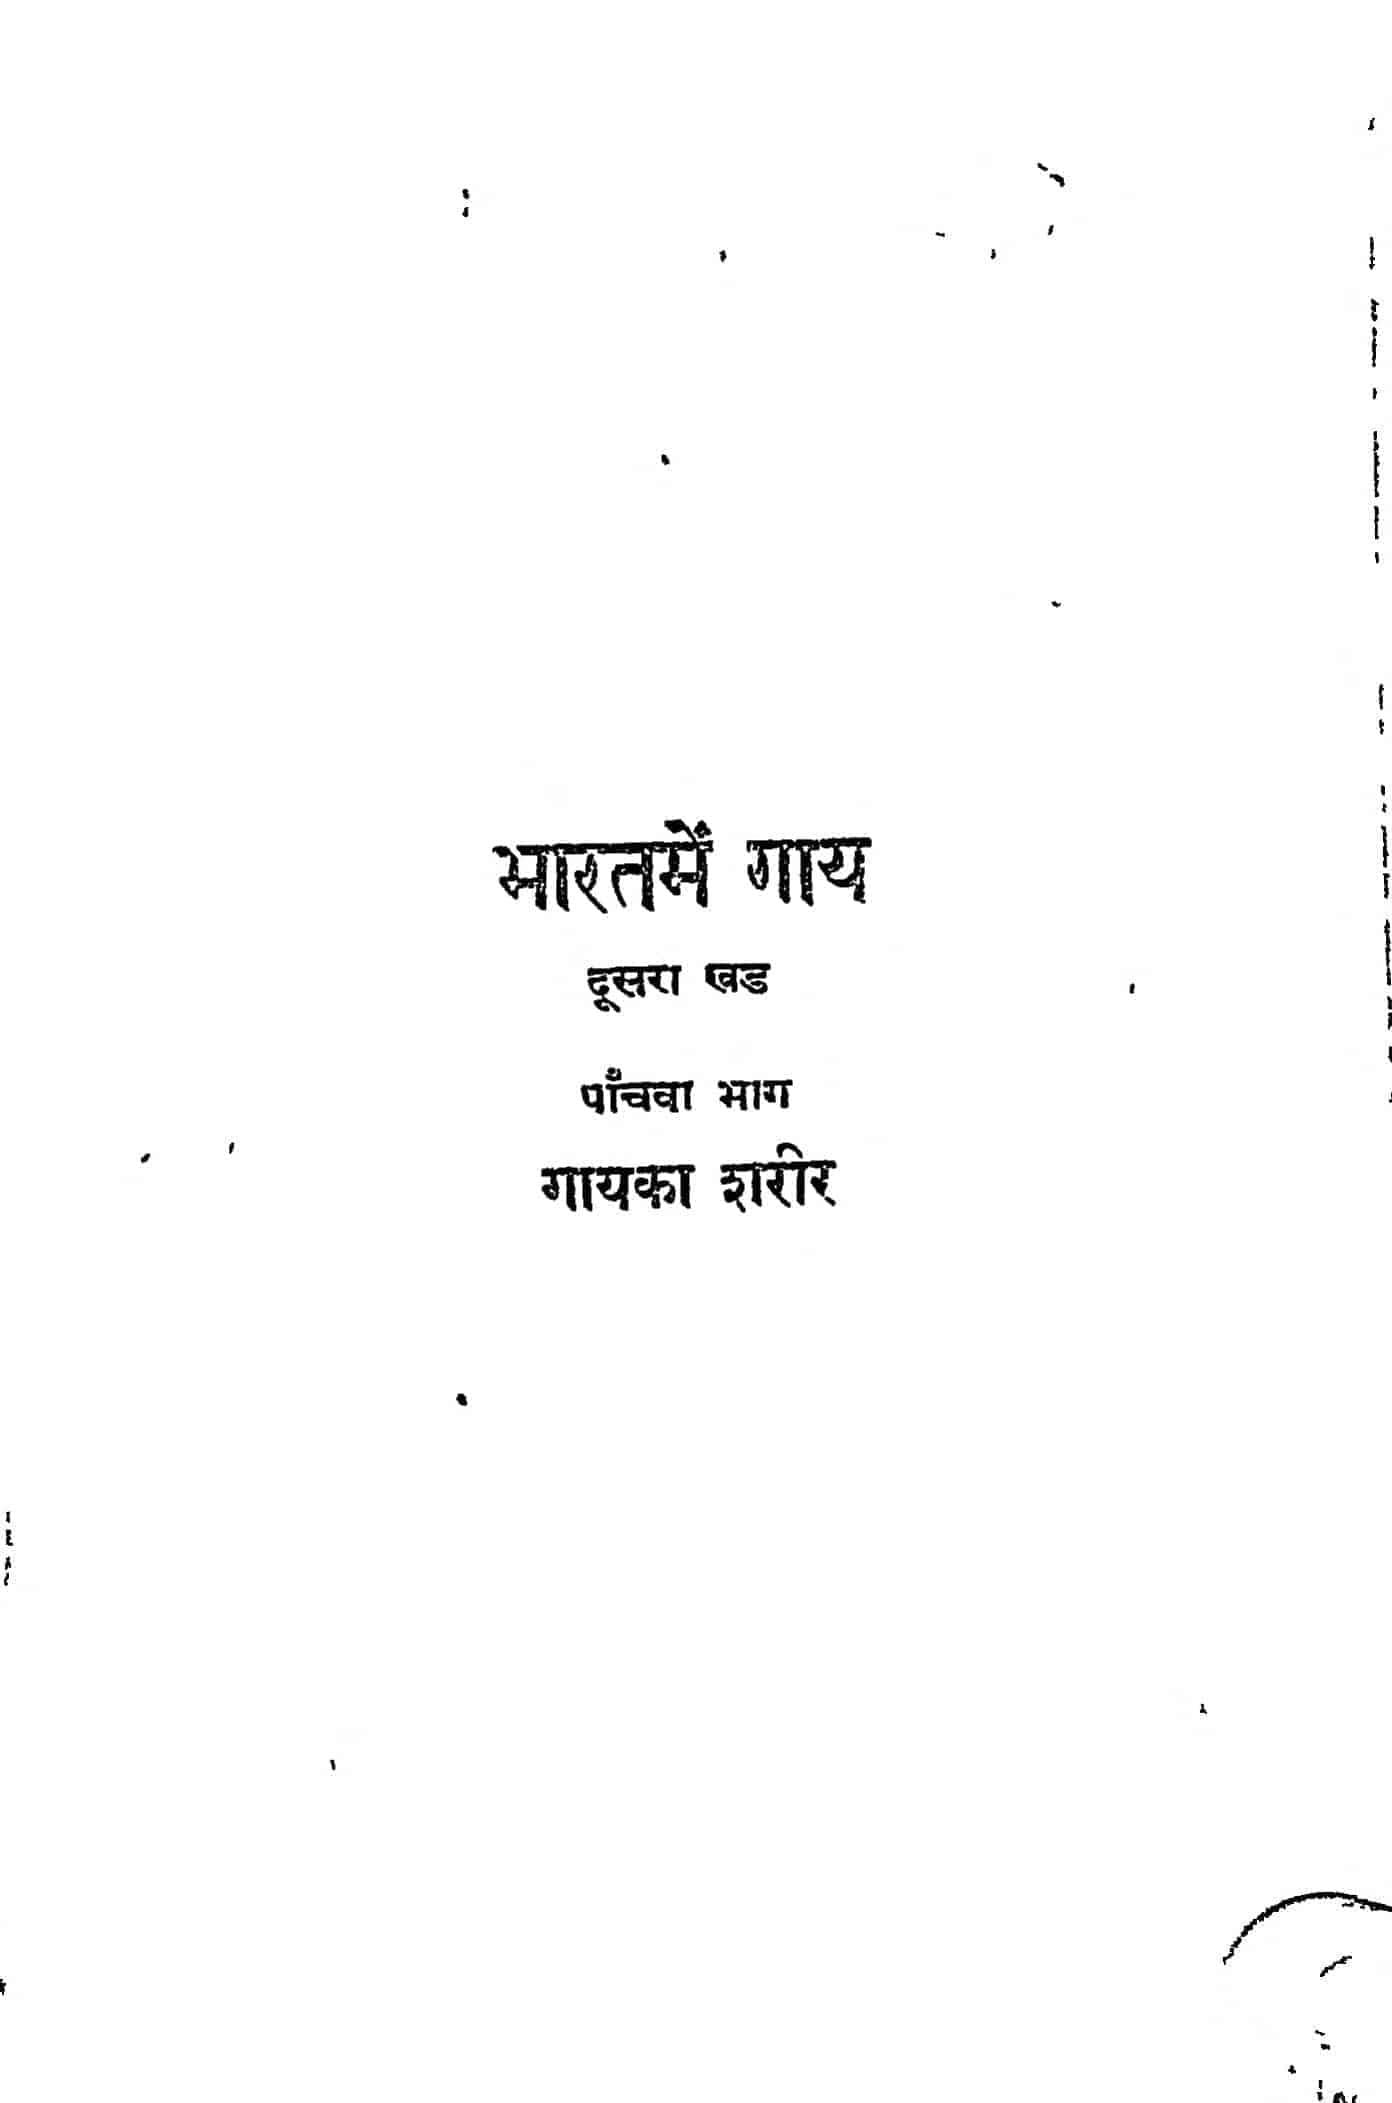 Harat Main Gay Bhag 1  by सतीश चंद्र - Satish Chandra